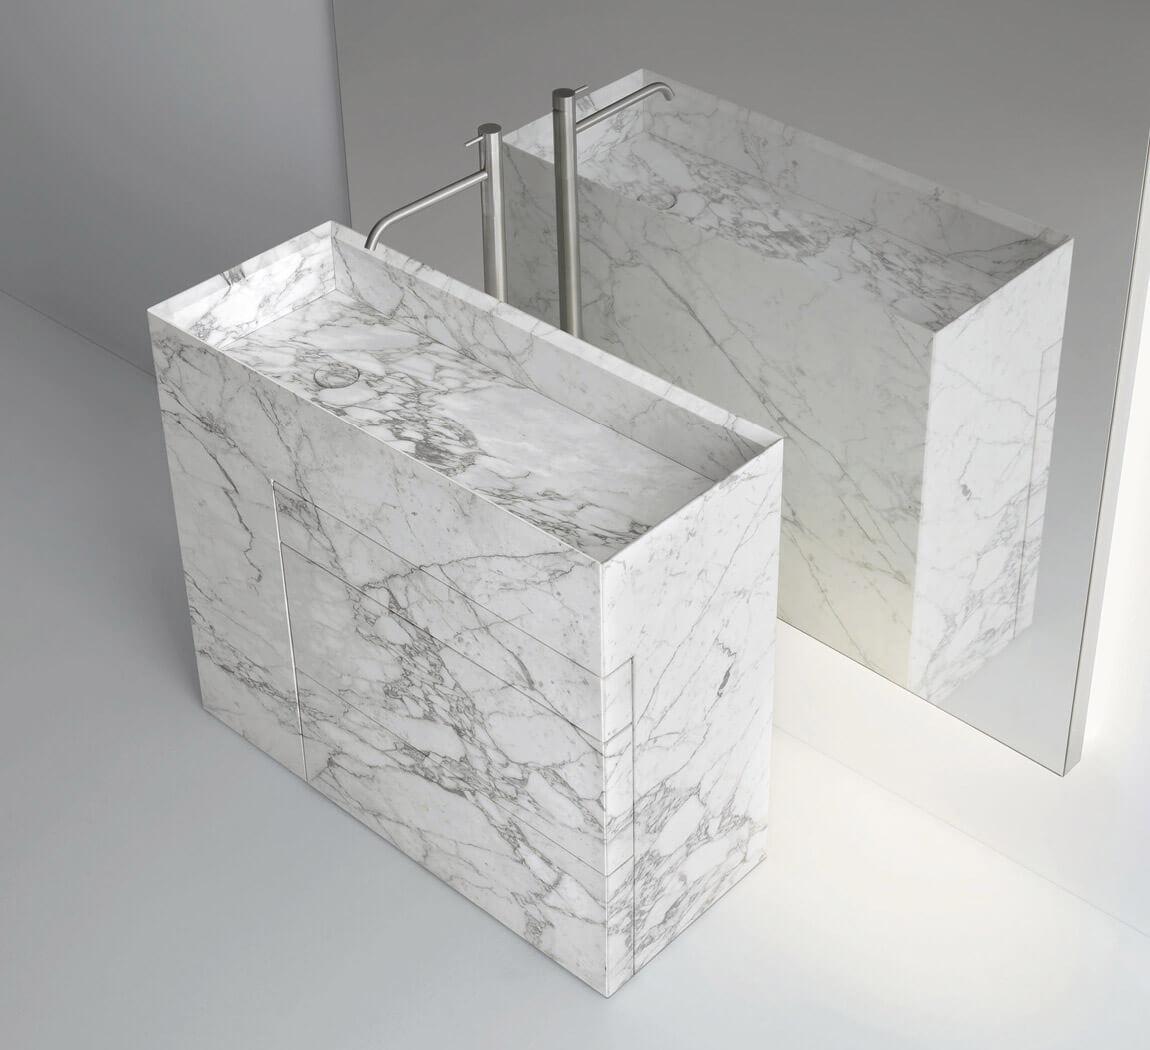 Badmöbel Möbel Badezimmer Design